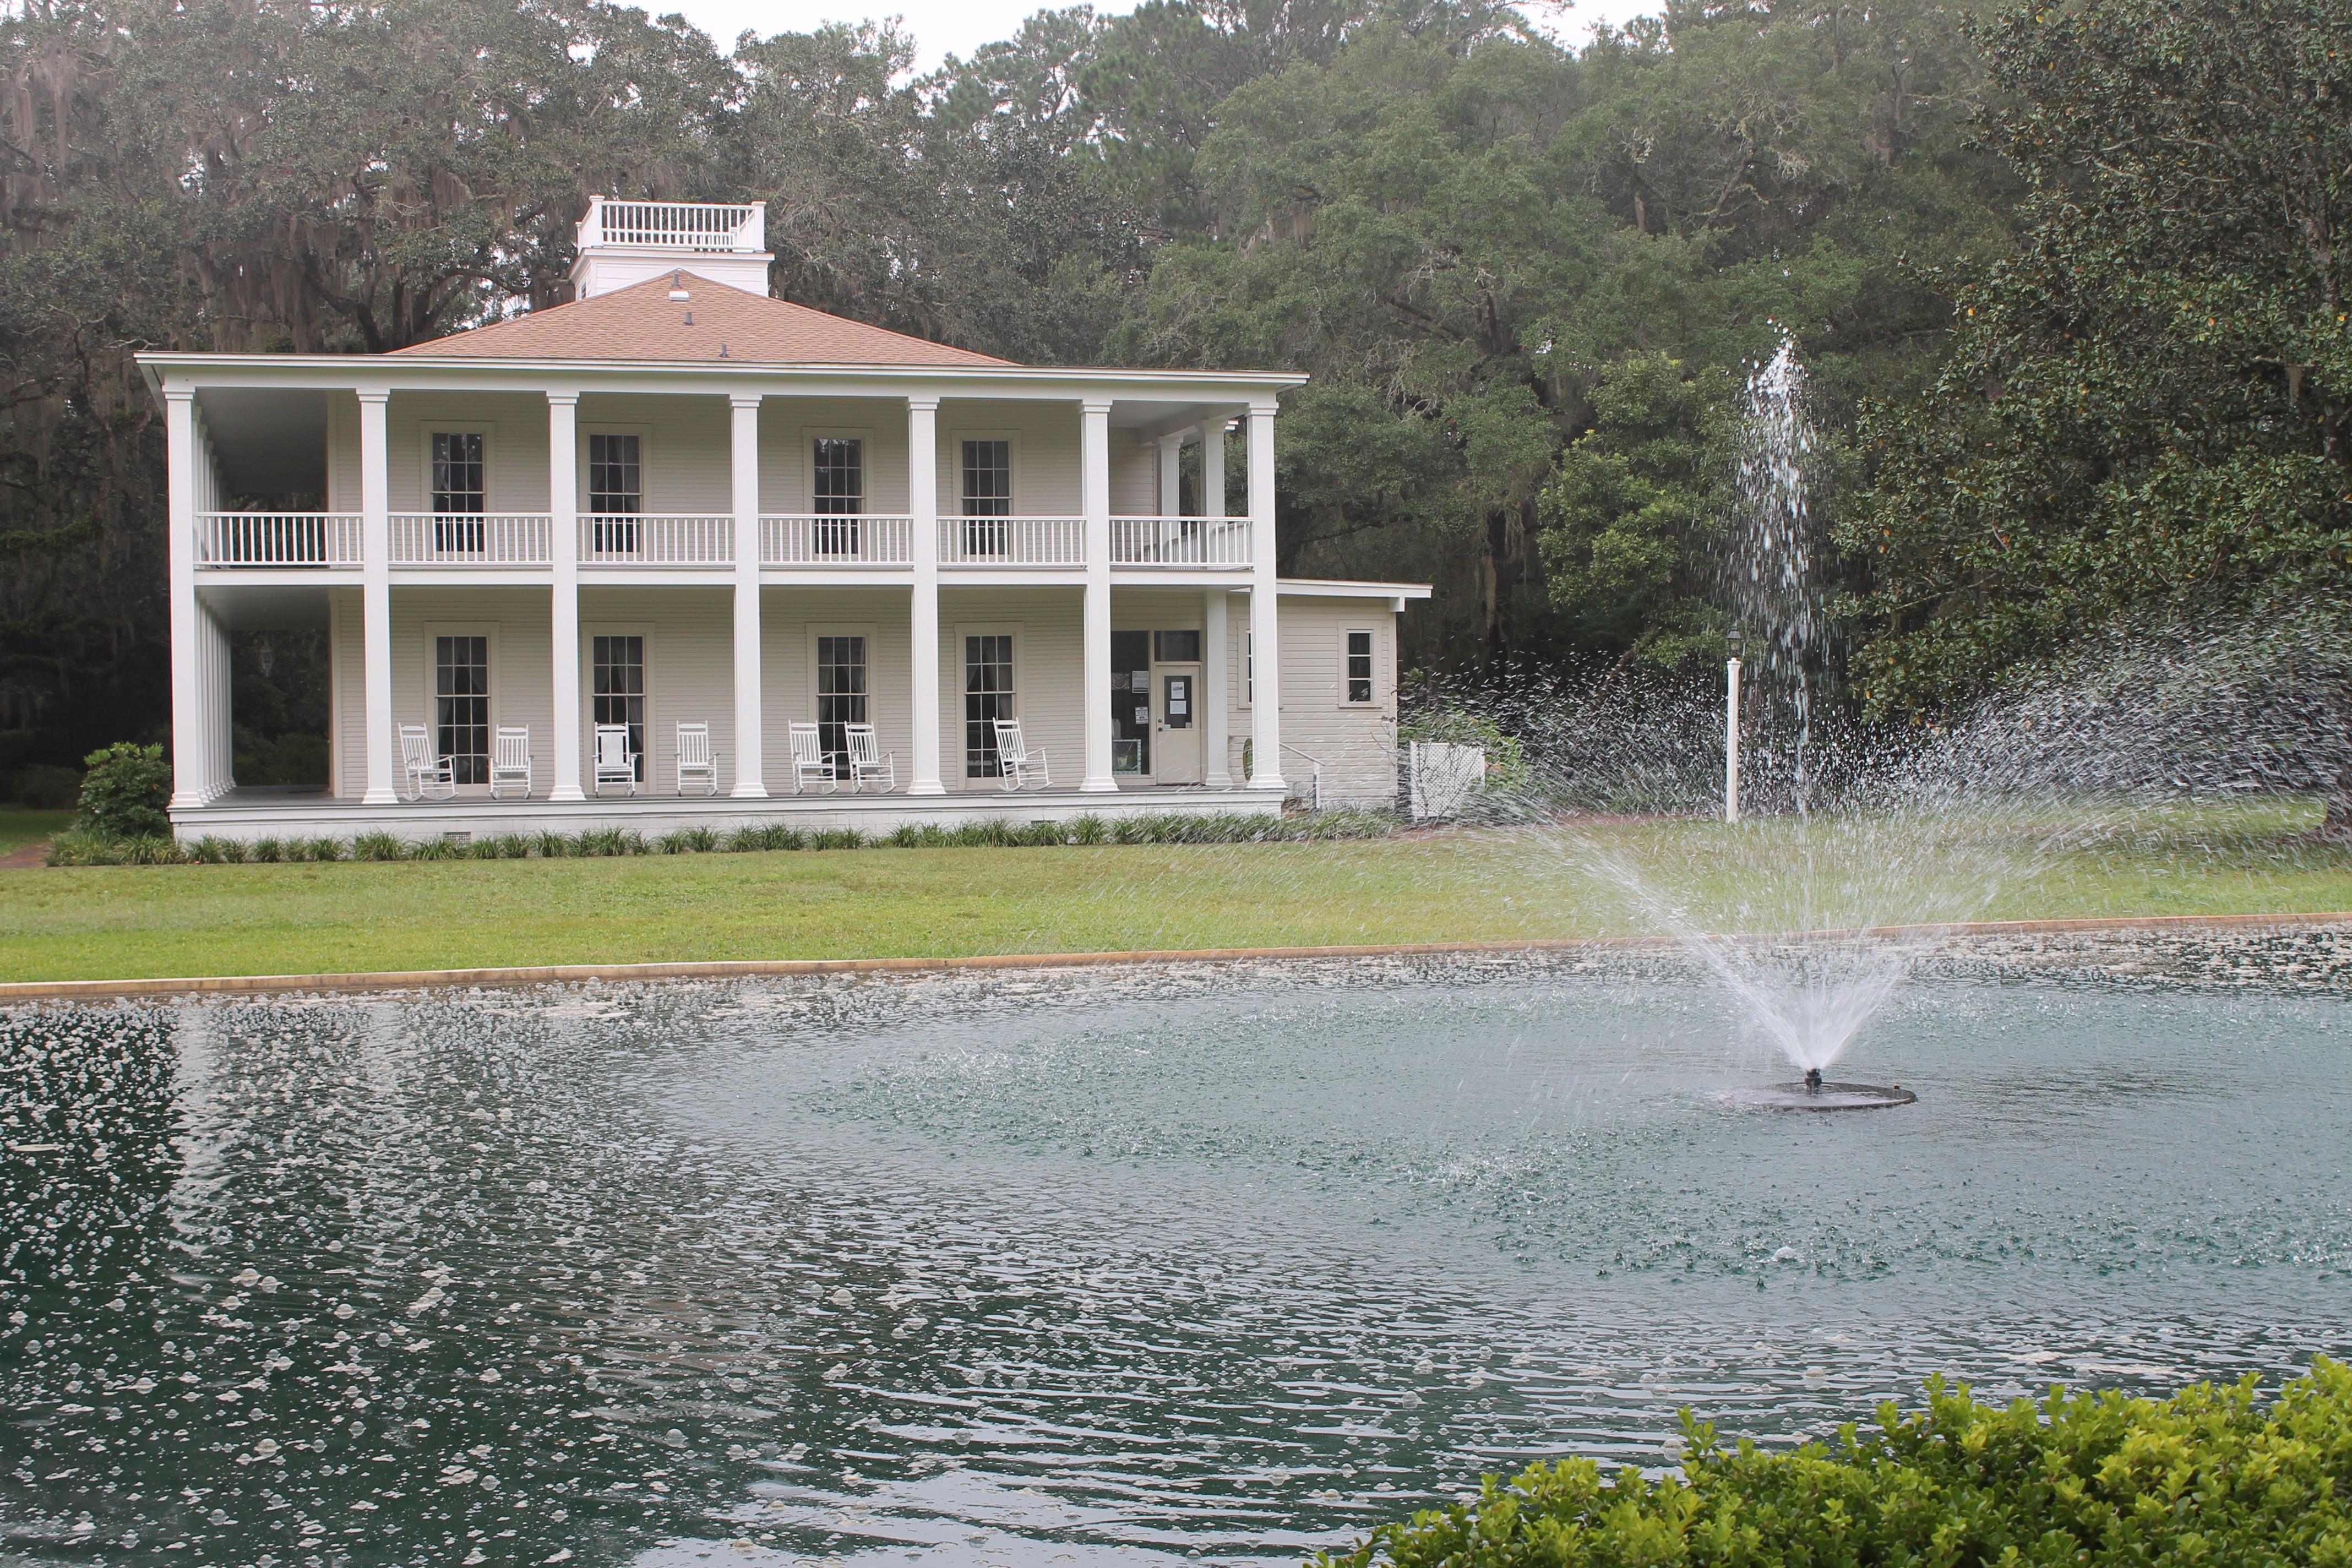 A visit to eden gardens state park northwest florida for Wesley house